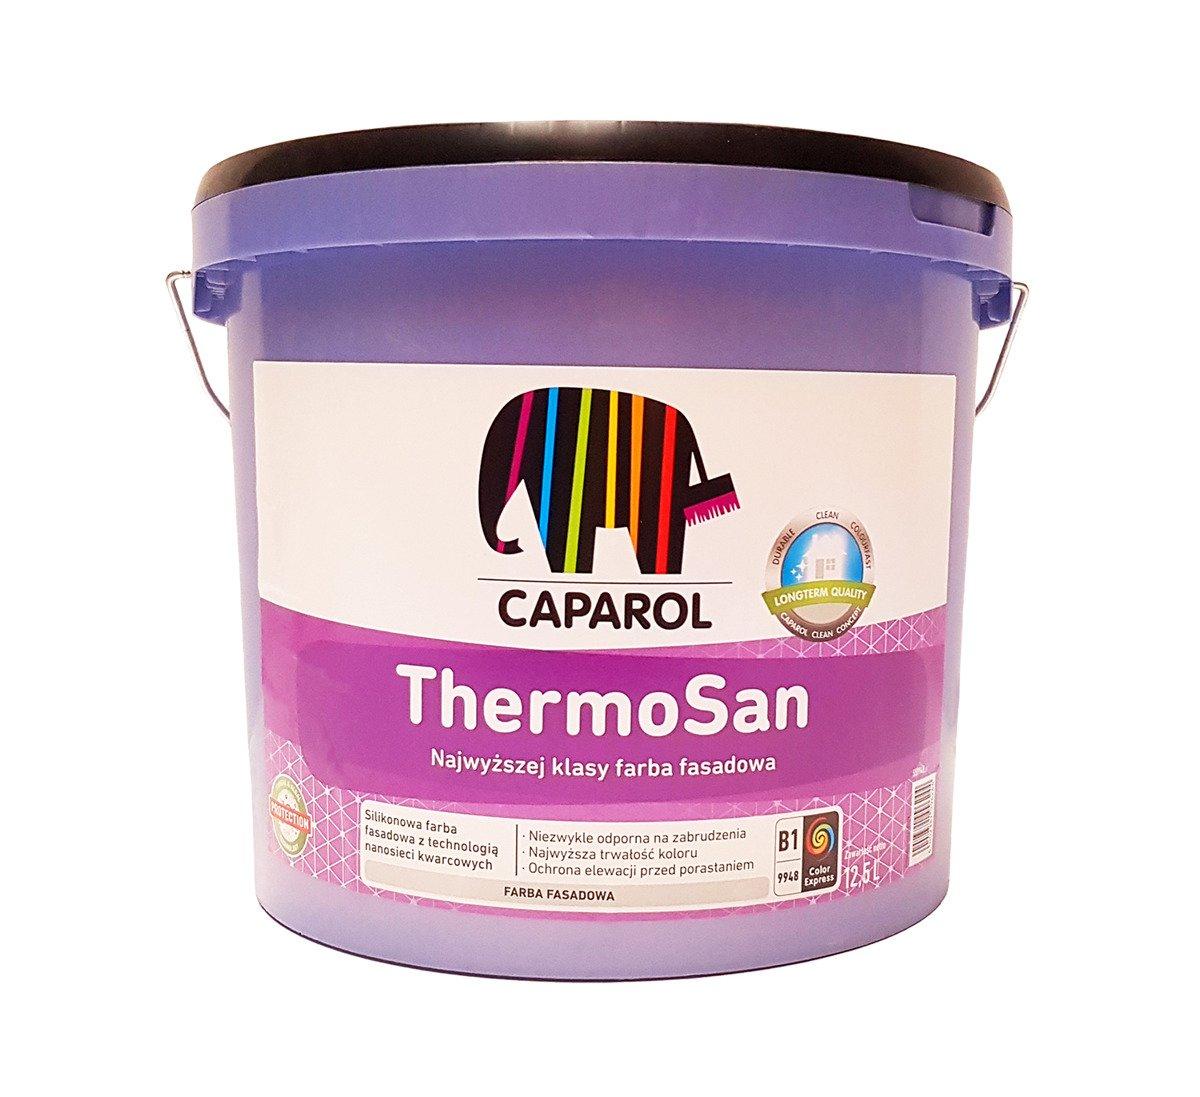 caparol thermosan nqg siliconharz fassadenfarbe 12 5 l wei 12 5 l. Black Bedroom Furniture Sets. Home Design Ideas